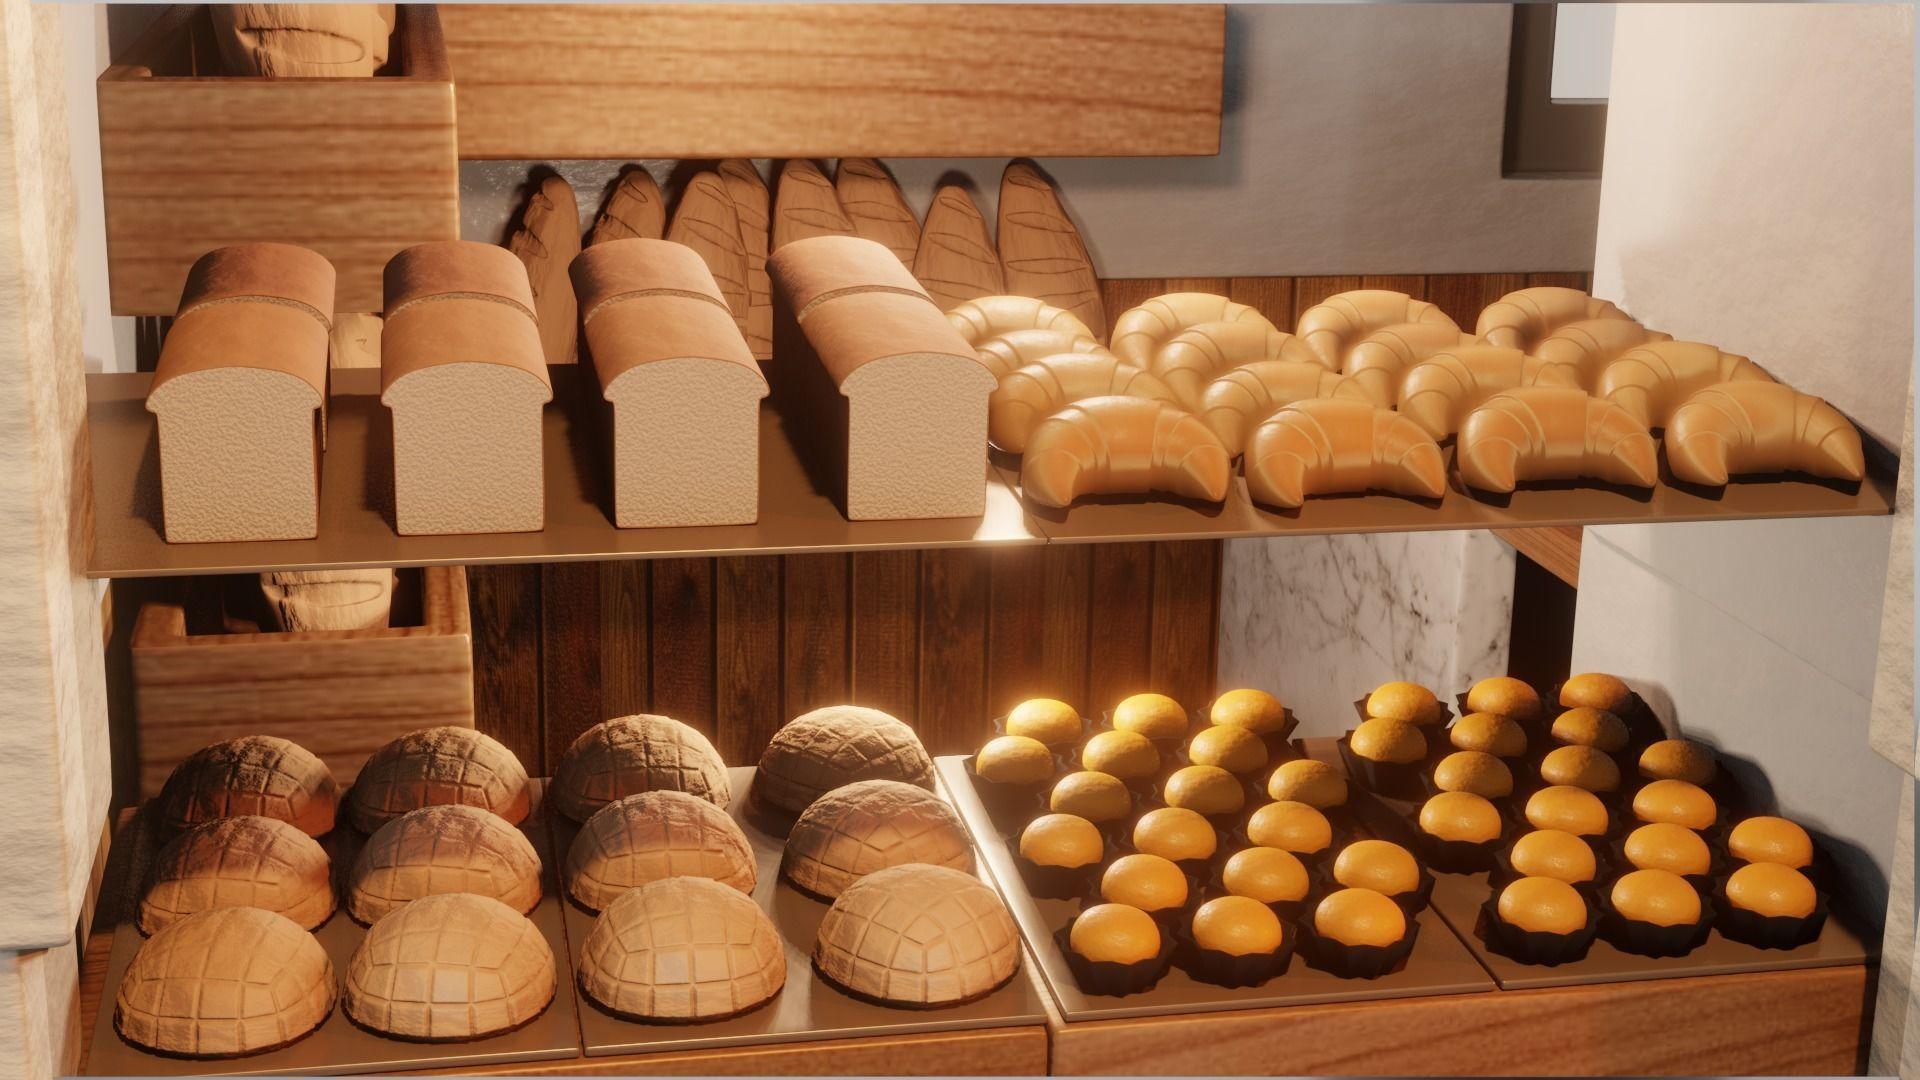 Bakery Assets